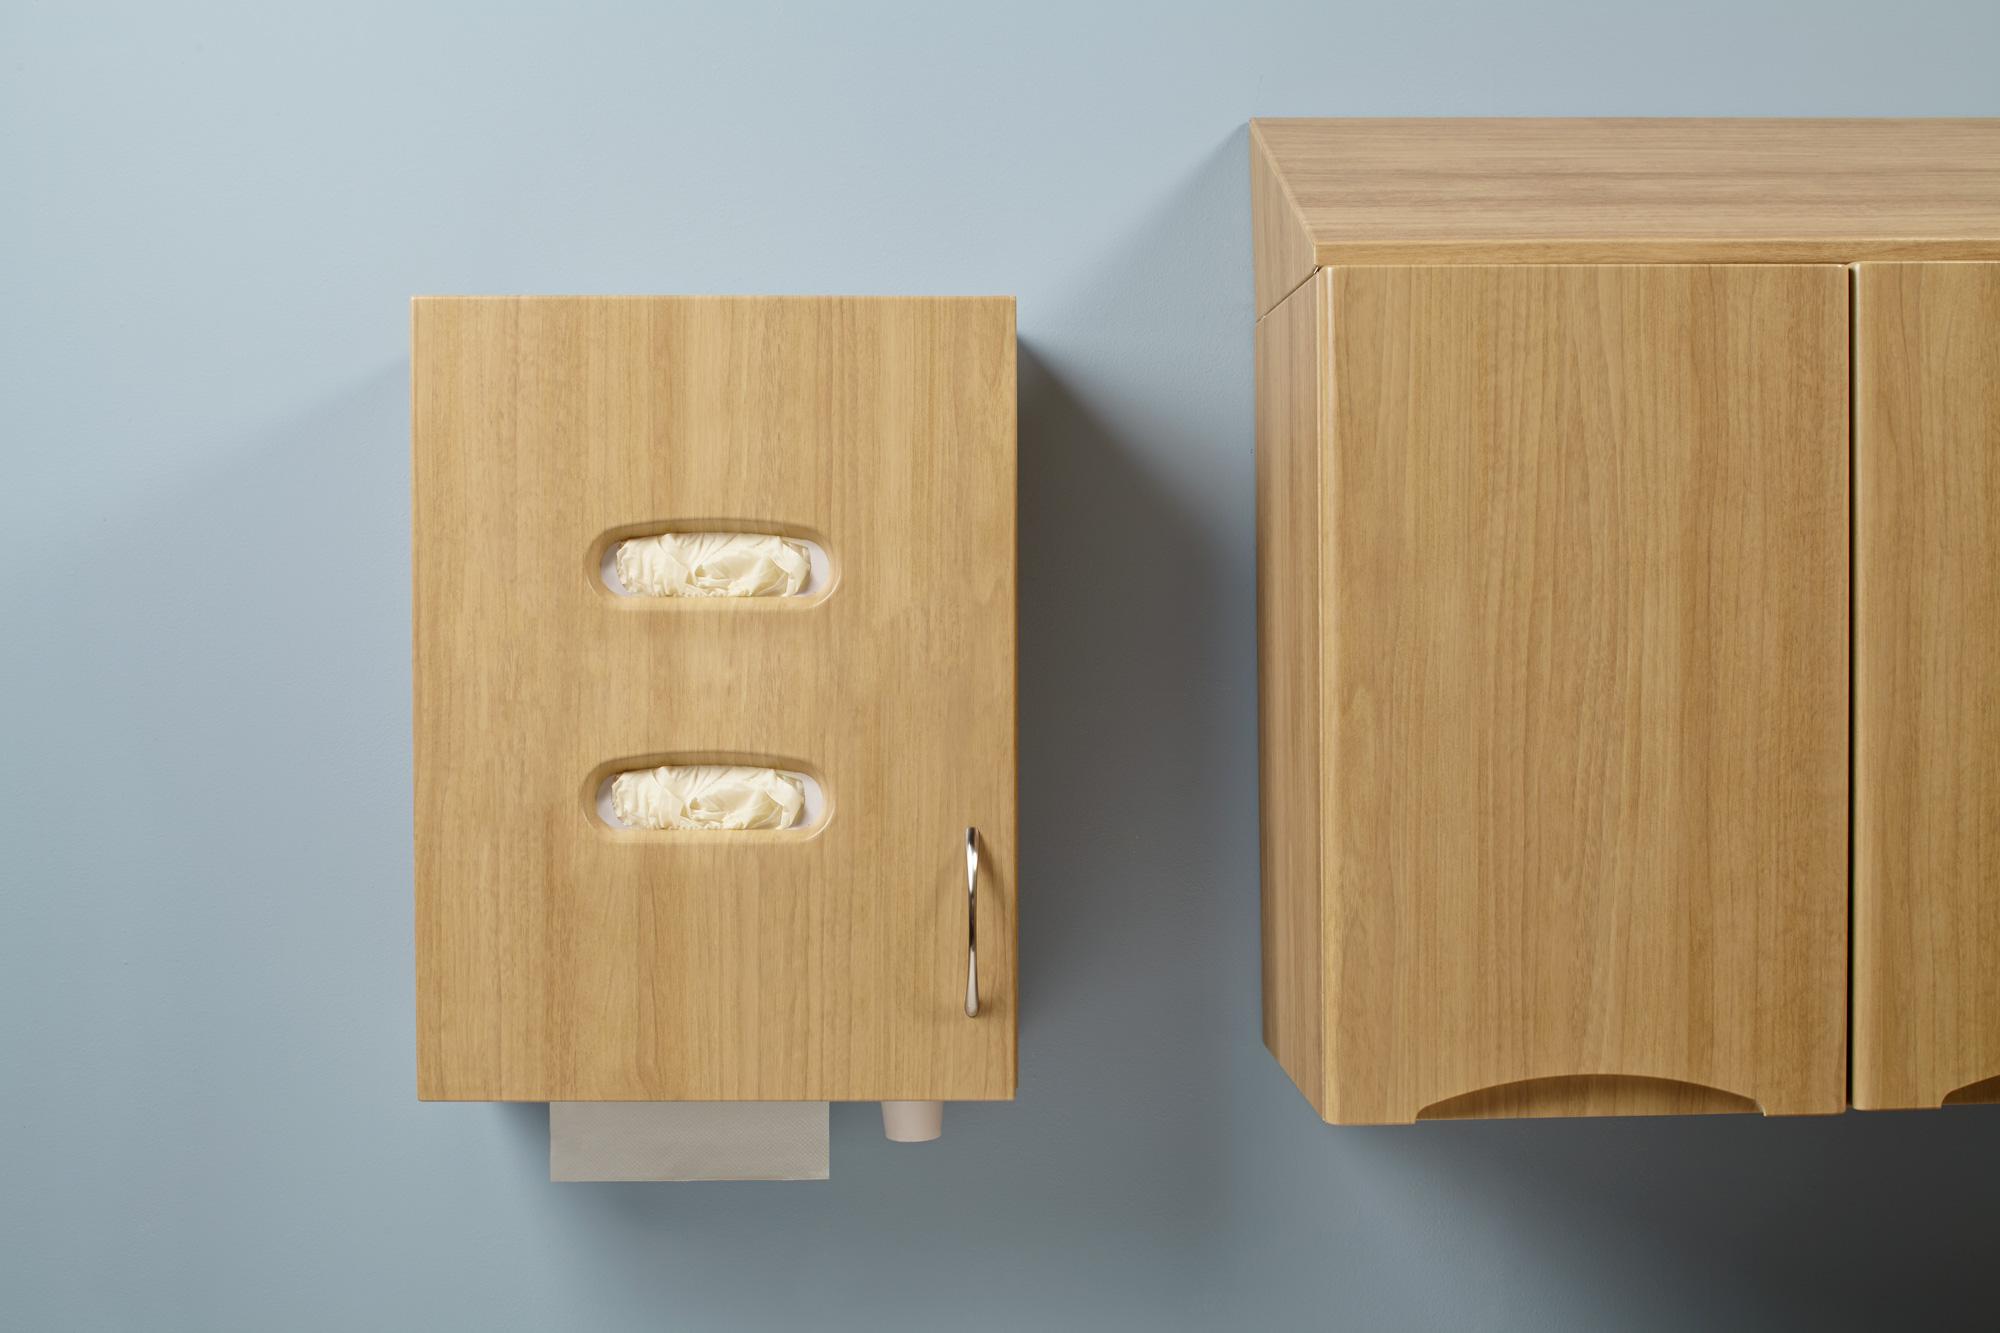 casework_mid_blueroom_glove_holder_two_box_set_2_22